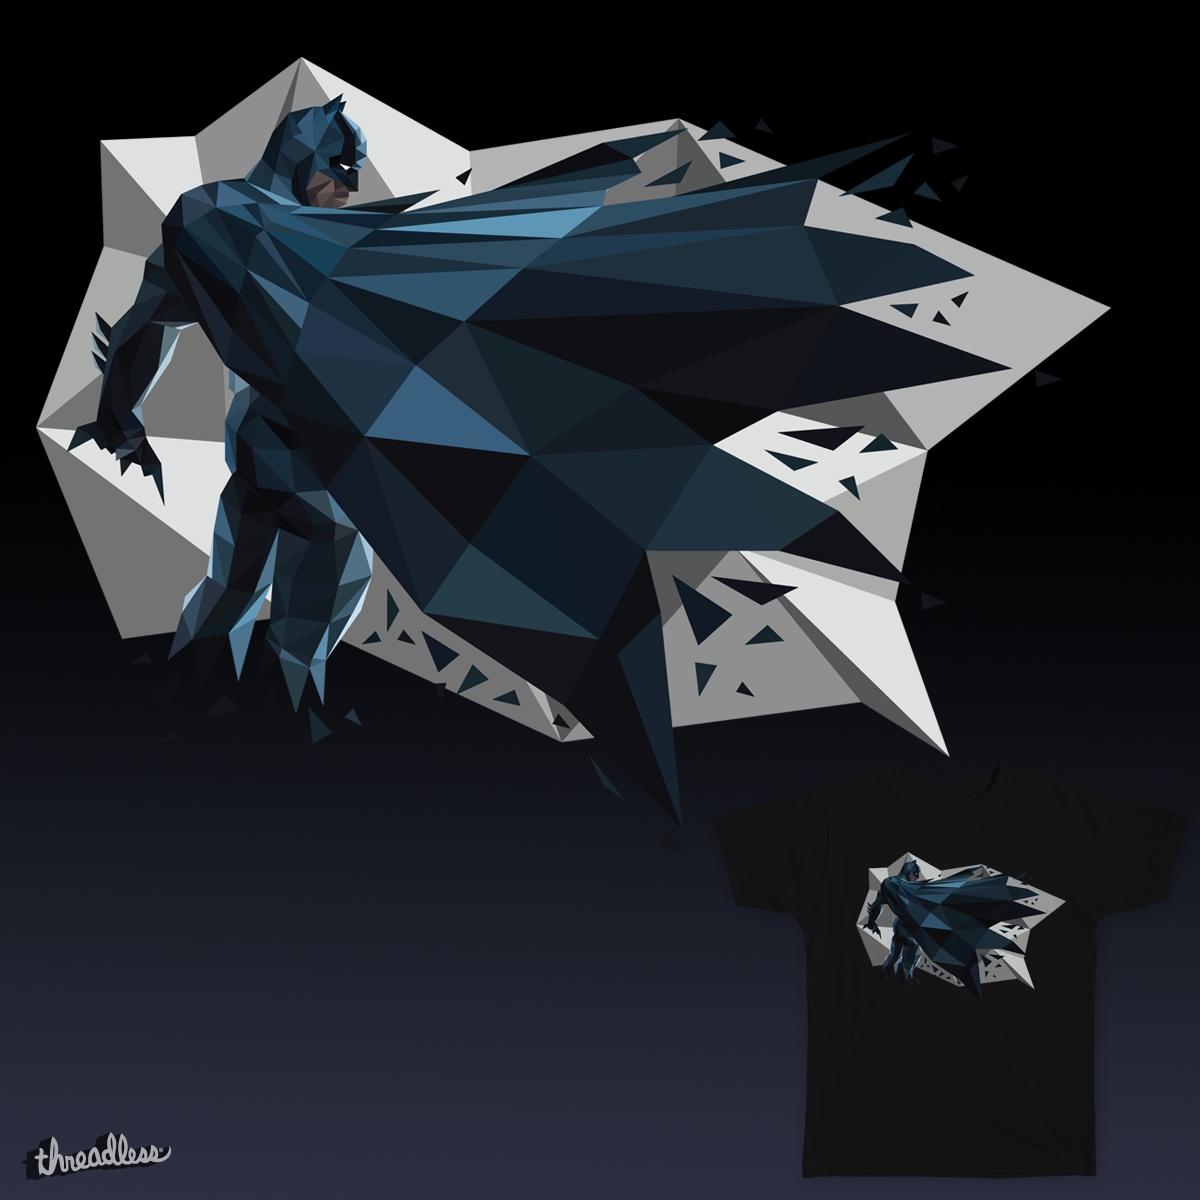 The Pythagorean Knight by Bradwirtz on Threadless